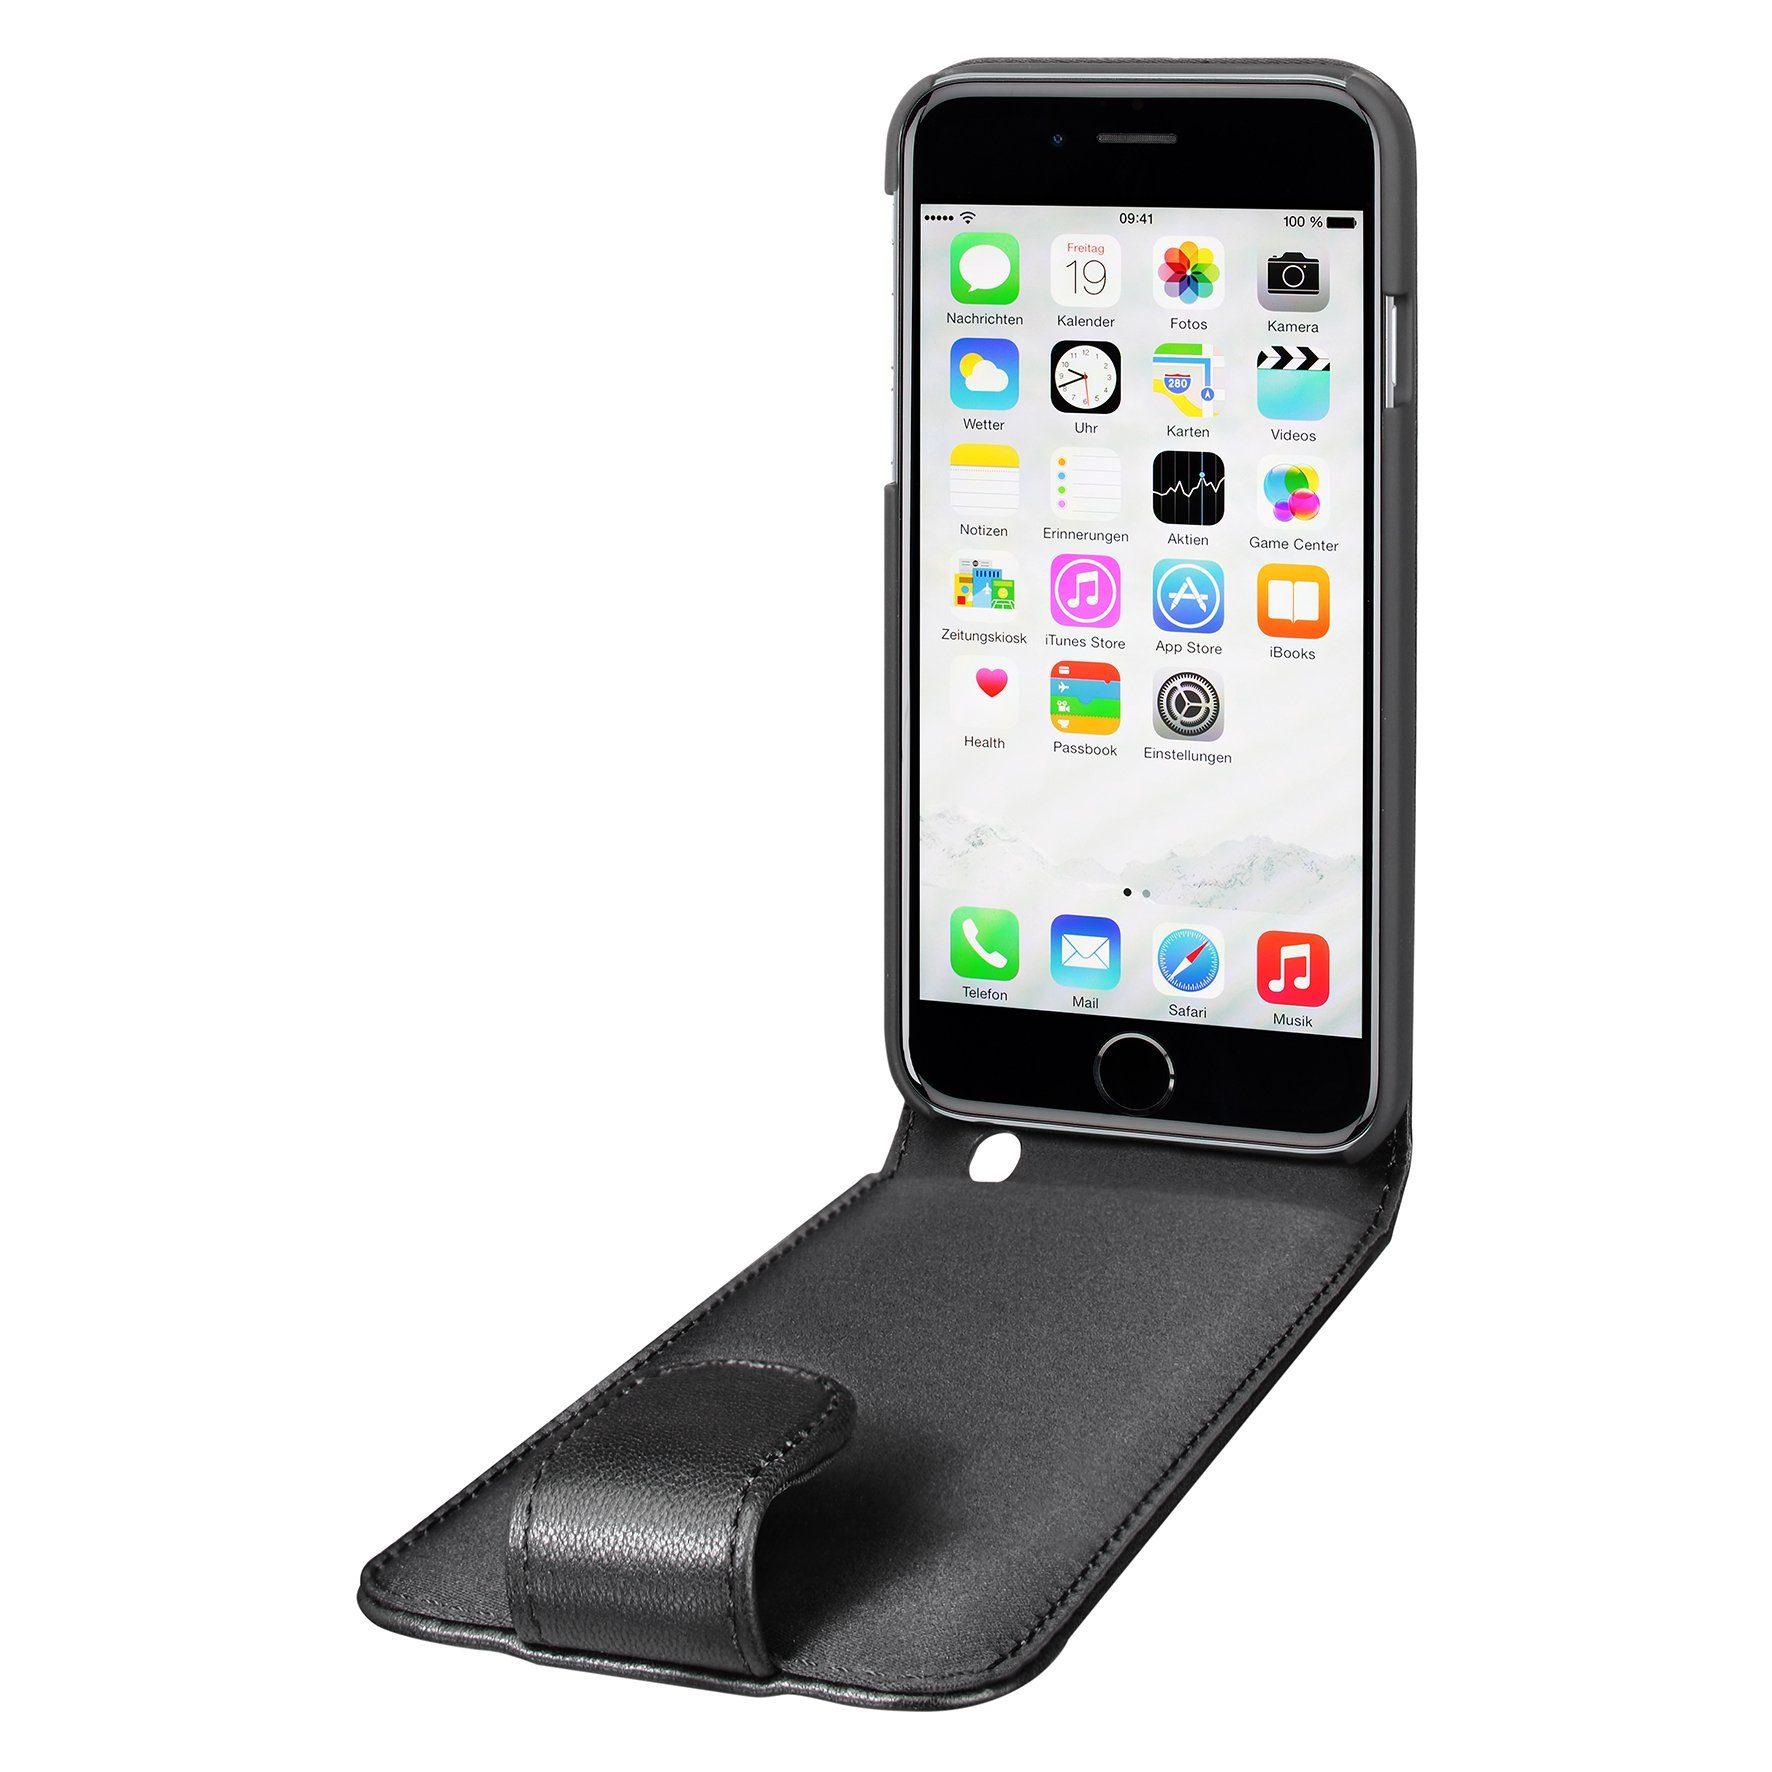 Artwizz Elegante Lederhülle mit sicherem Rundumschutz »SeeJacket Leather FLIP iPhone 6/6s Plus«